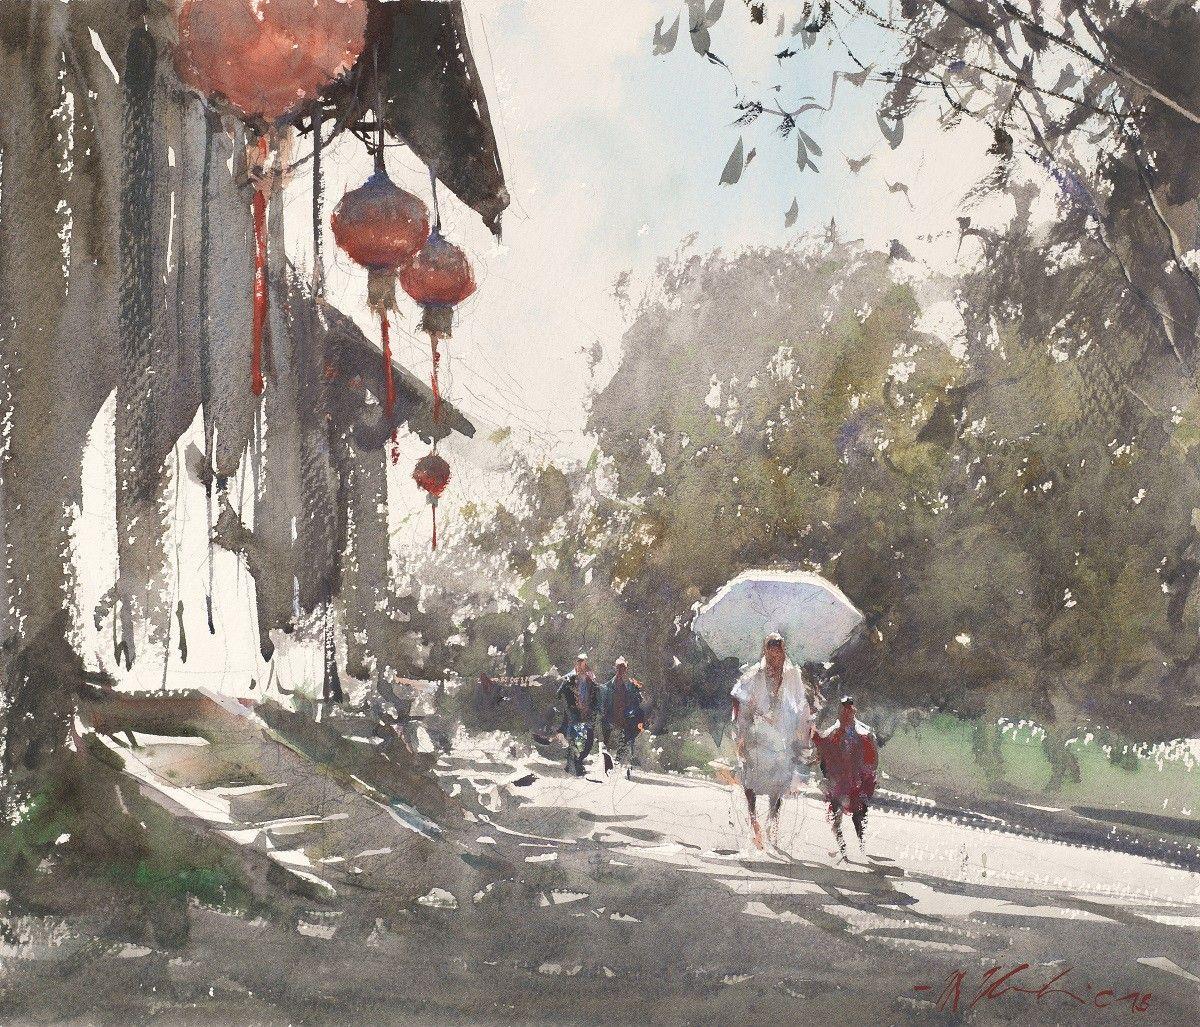 Joseph Zbukvic in 2020 | Water painting. Watercolor painting techniques. Joseph zbukvic